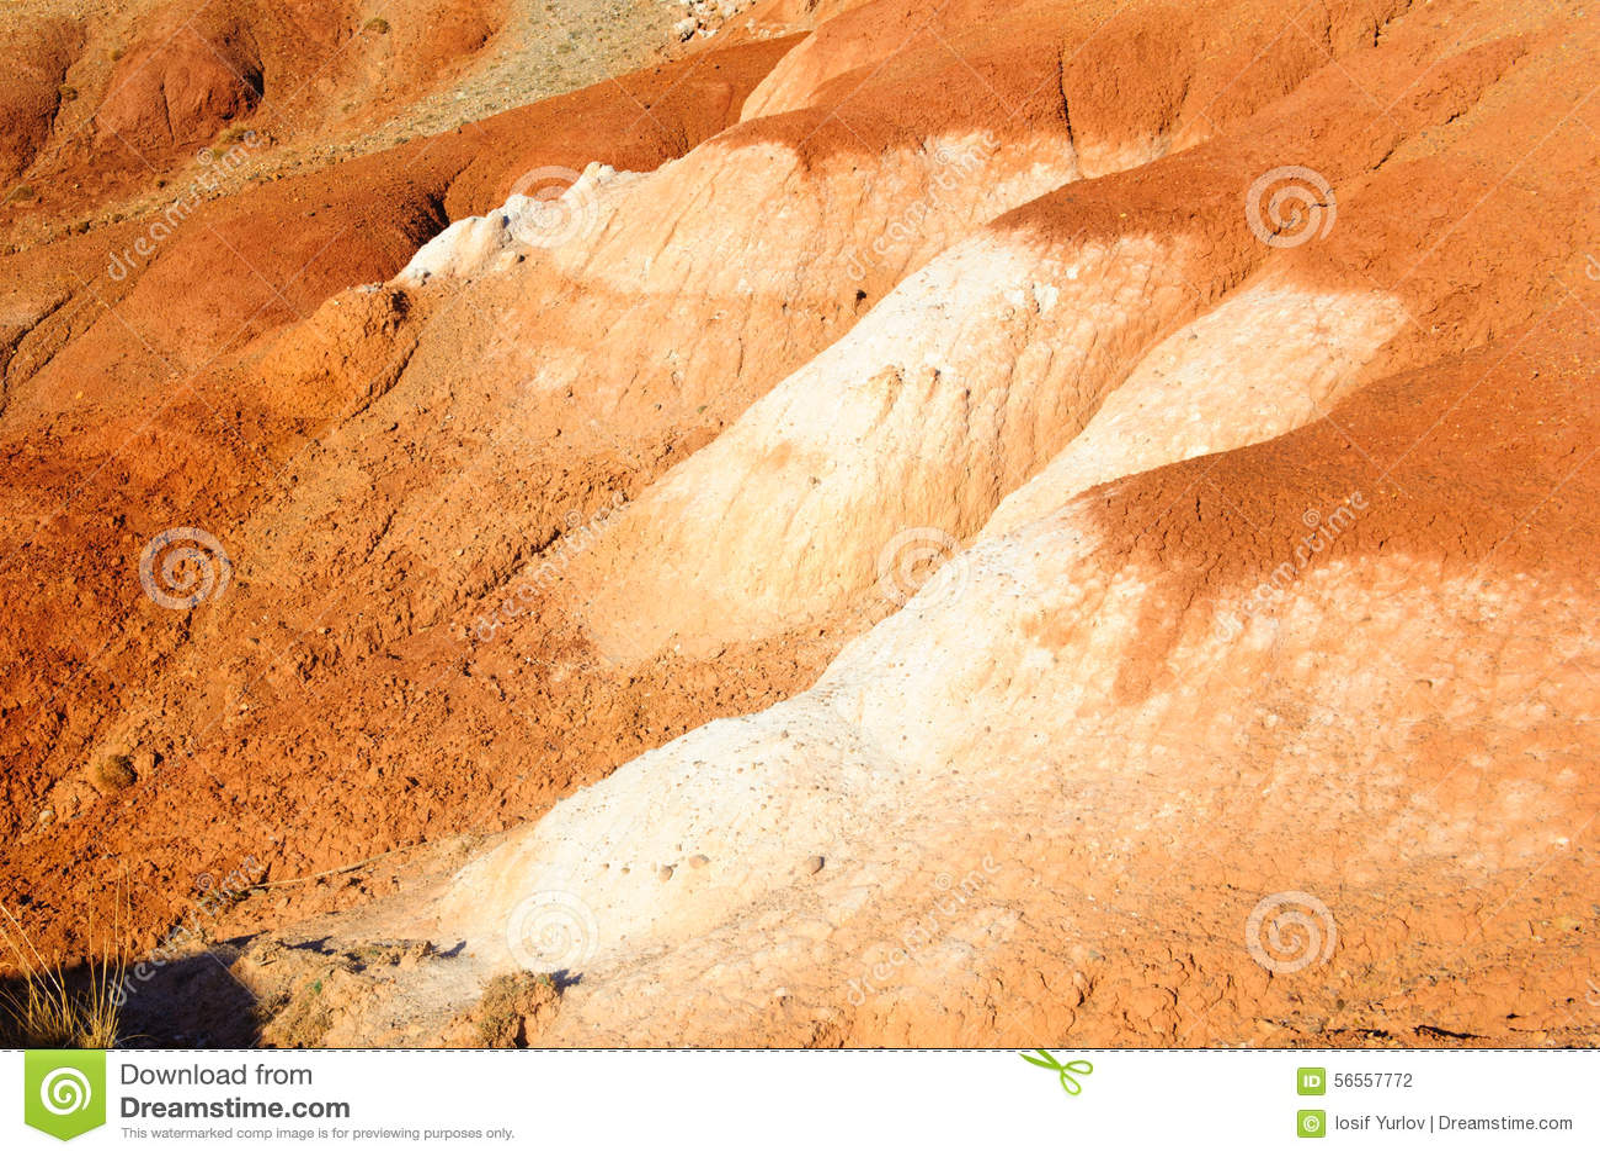 Download Χώμα χρώματος των καταθέσεων υδραργύρου σε Altai Στοκ Εικόνες - εικόνα από cinnabar, πράσινος: 56557772